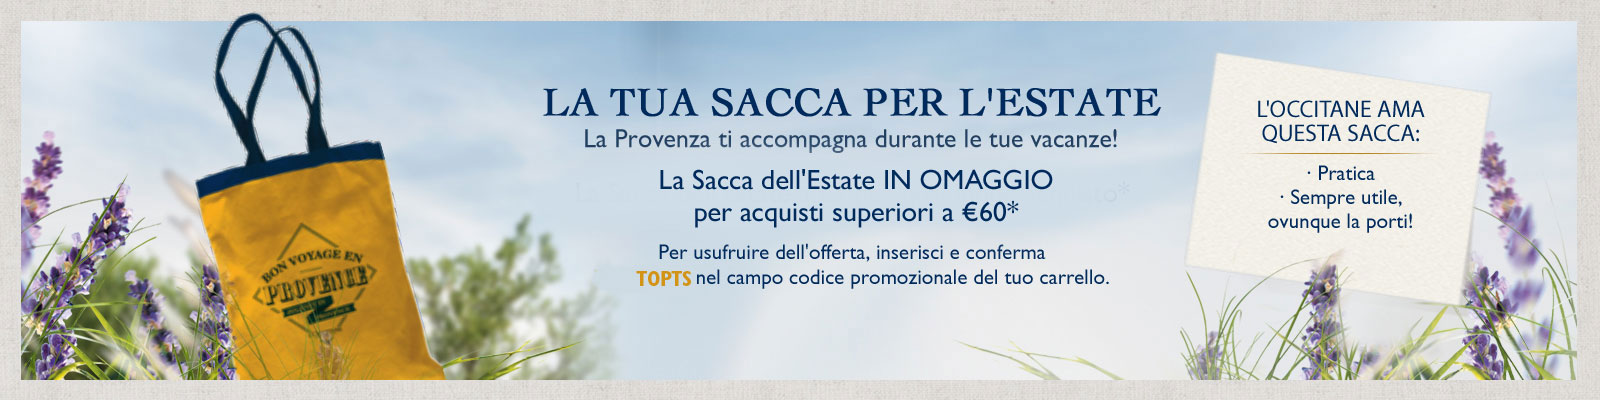 Offerta Sacca - L'Occitane Italia